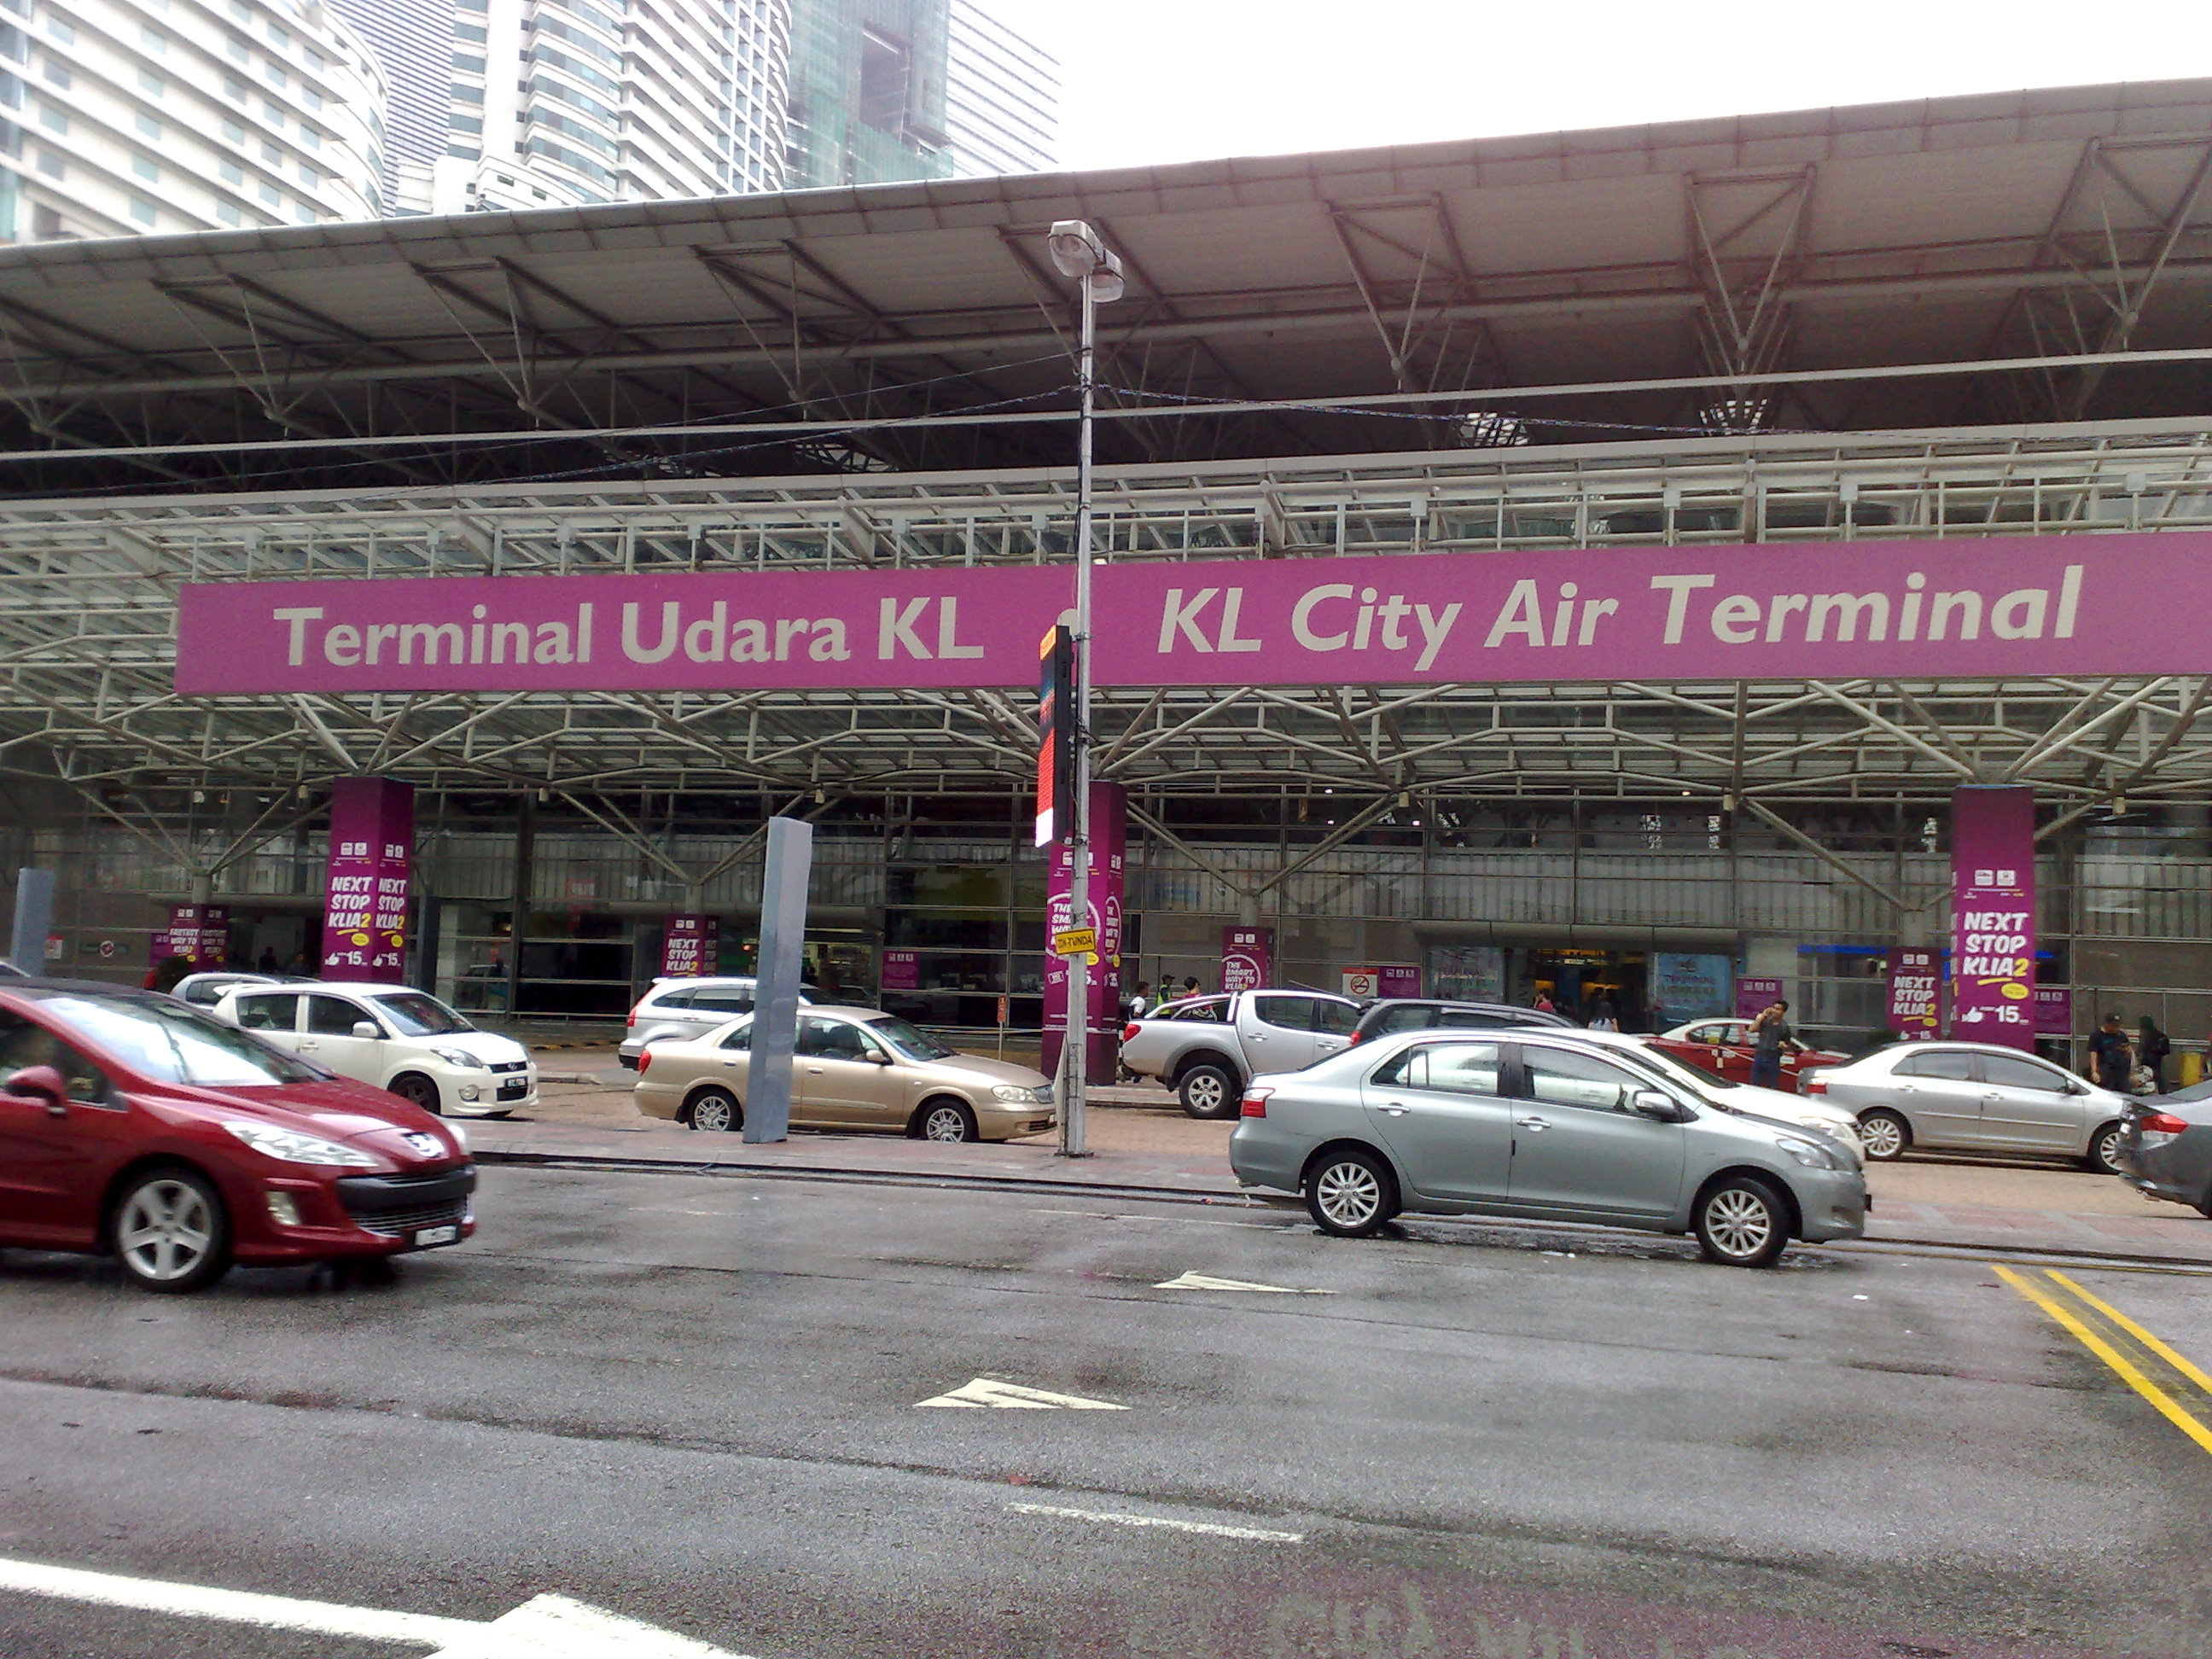 Parking problems in Kuala Lumpur